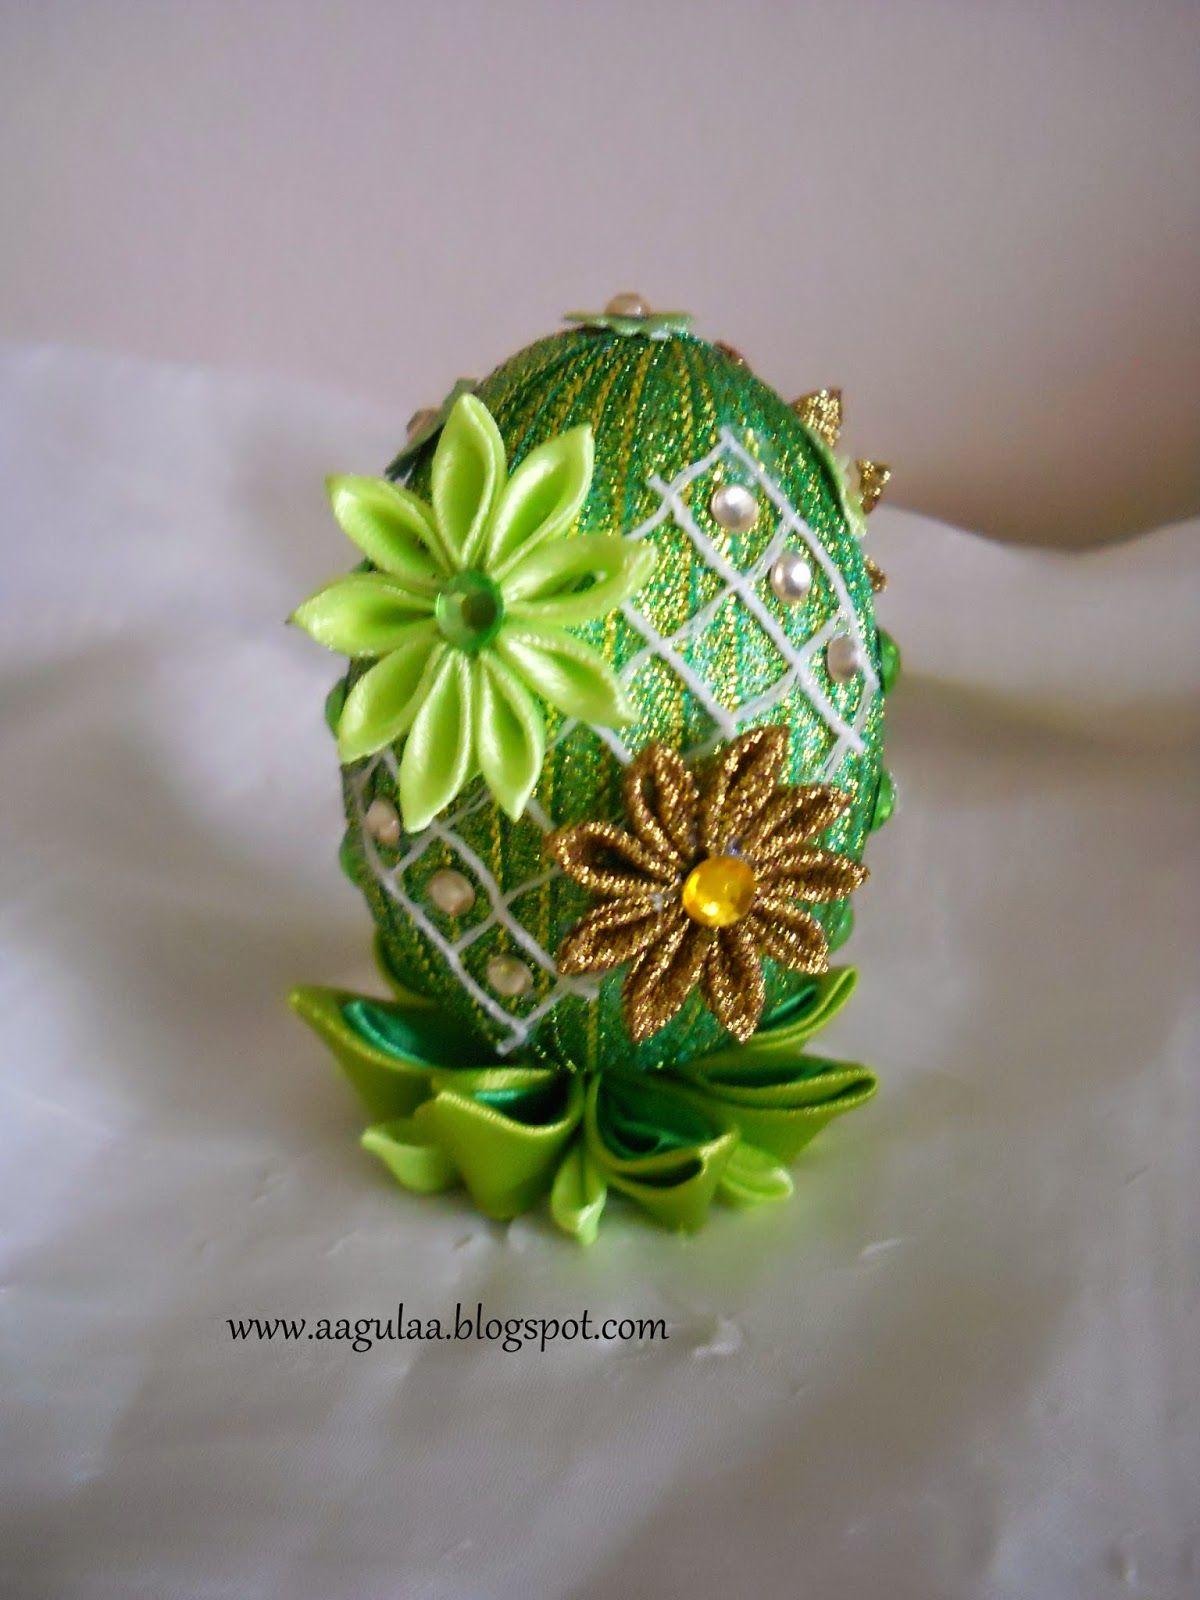 Moja Mala Galeria Tworkow Pisanki Kanzashi Kanzashi Kanzashi Tutorial Easter Design